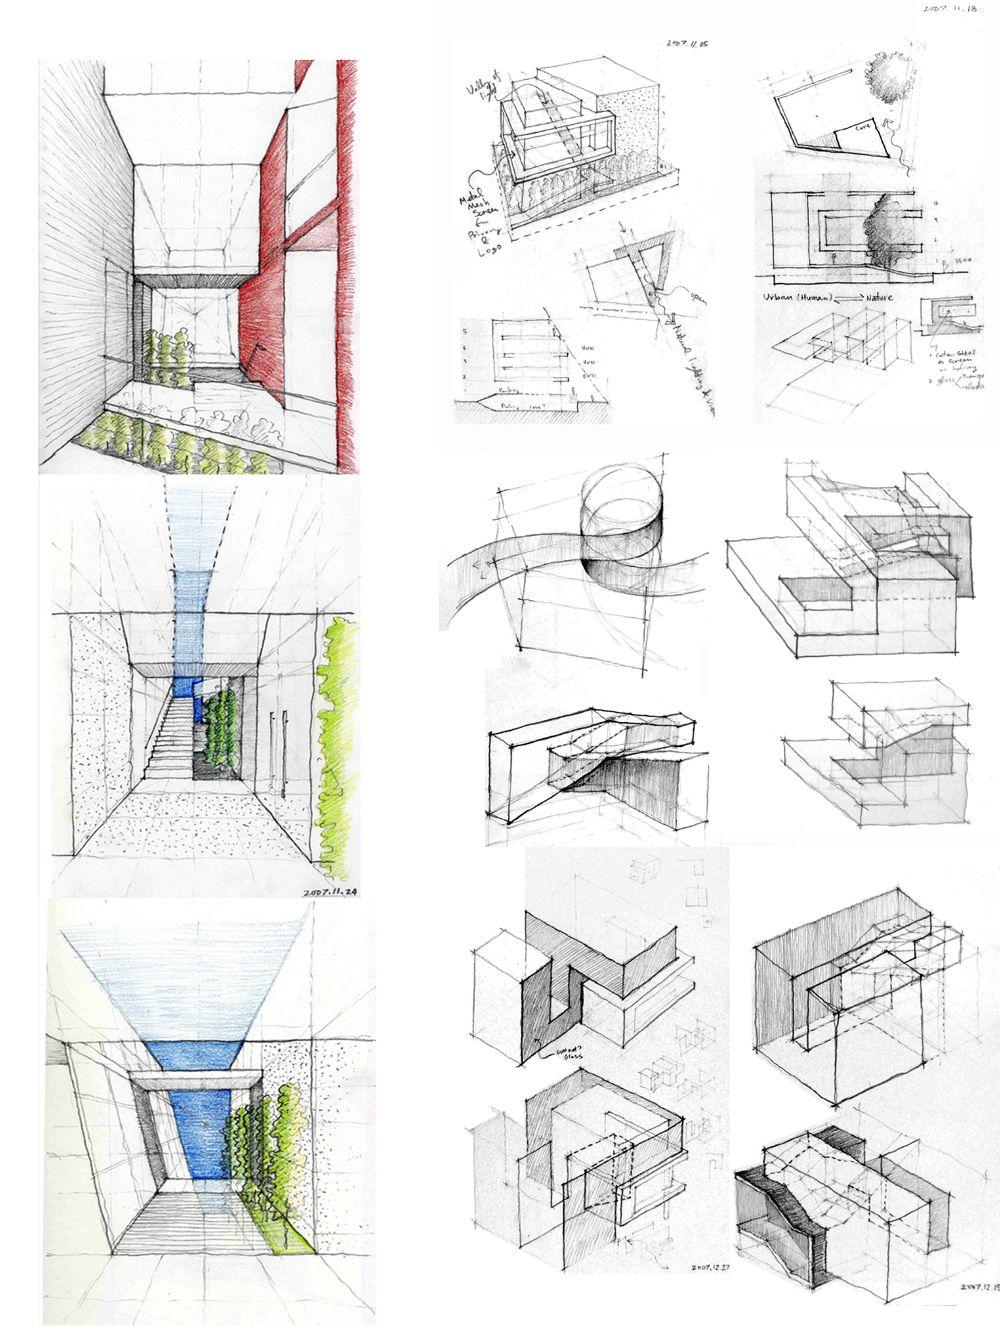 M hahn design sketches architecture and for Urban design concepts architecture